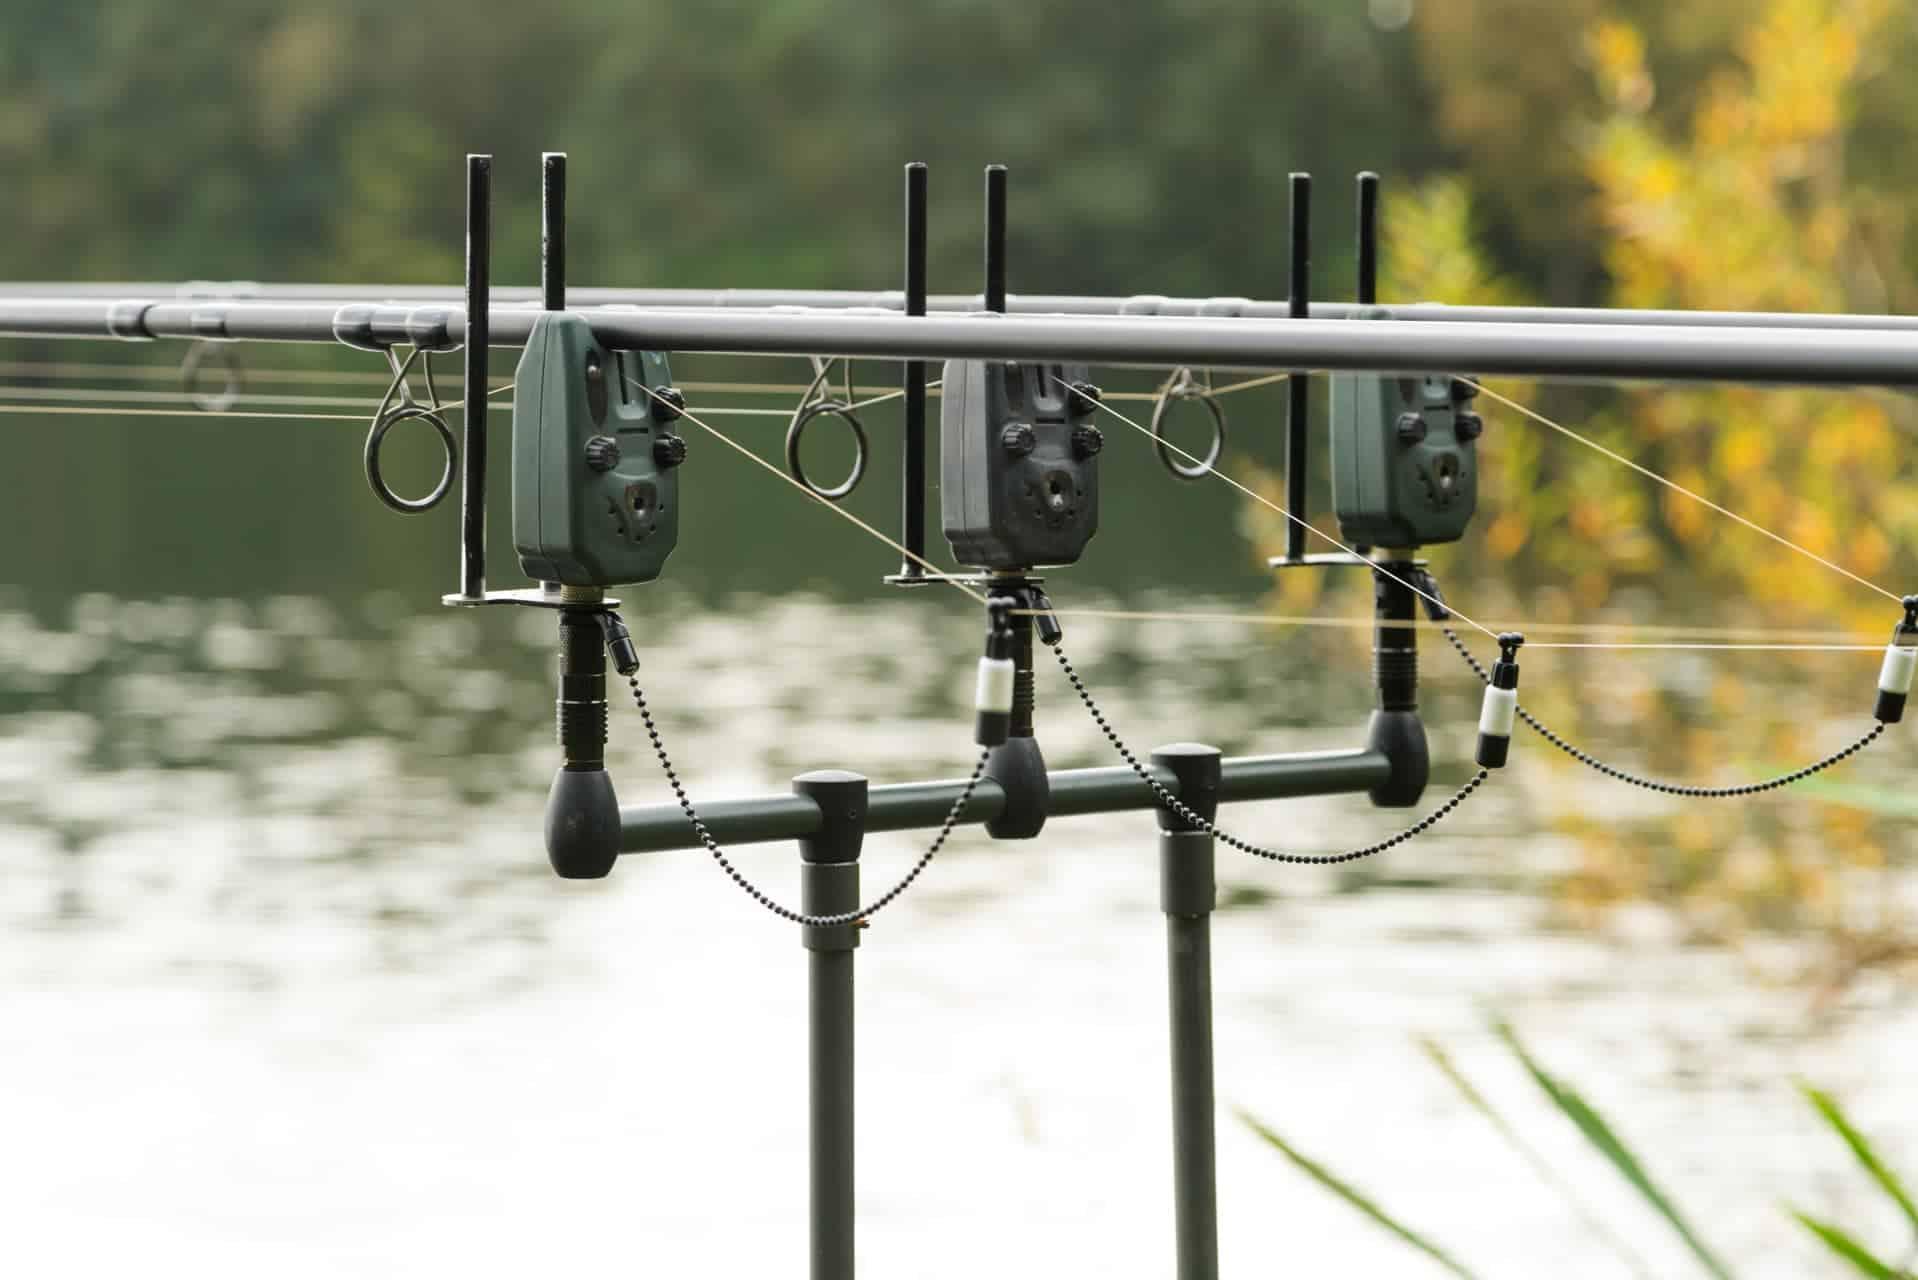 bidmelder til karpefiskeri - bidmelder til størfiskeri bedste